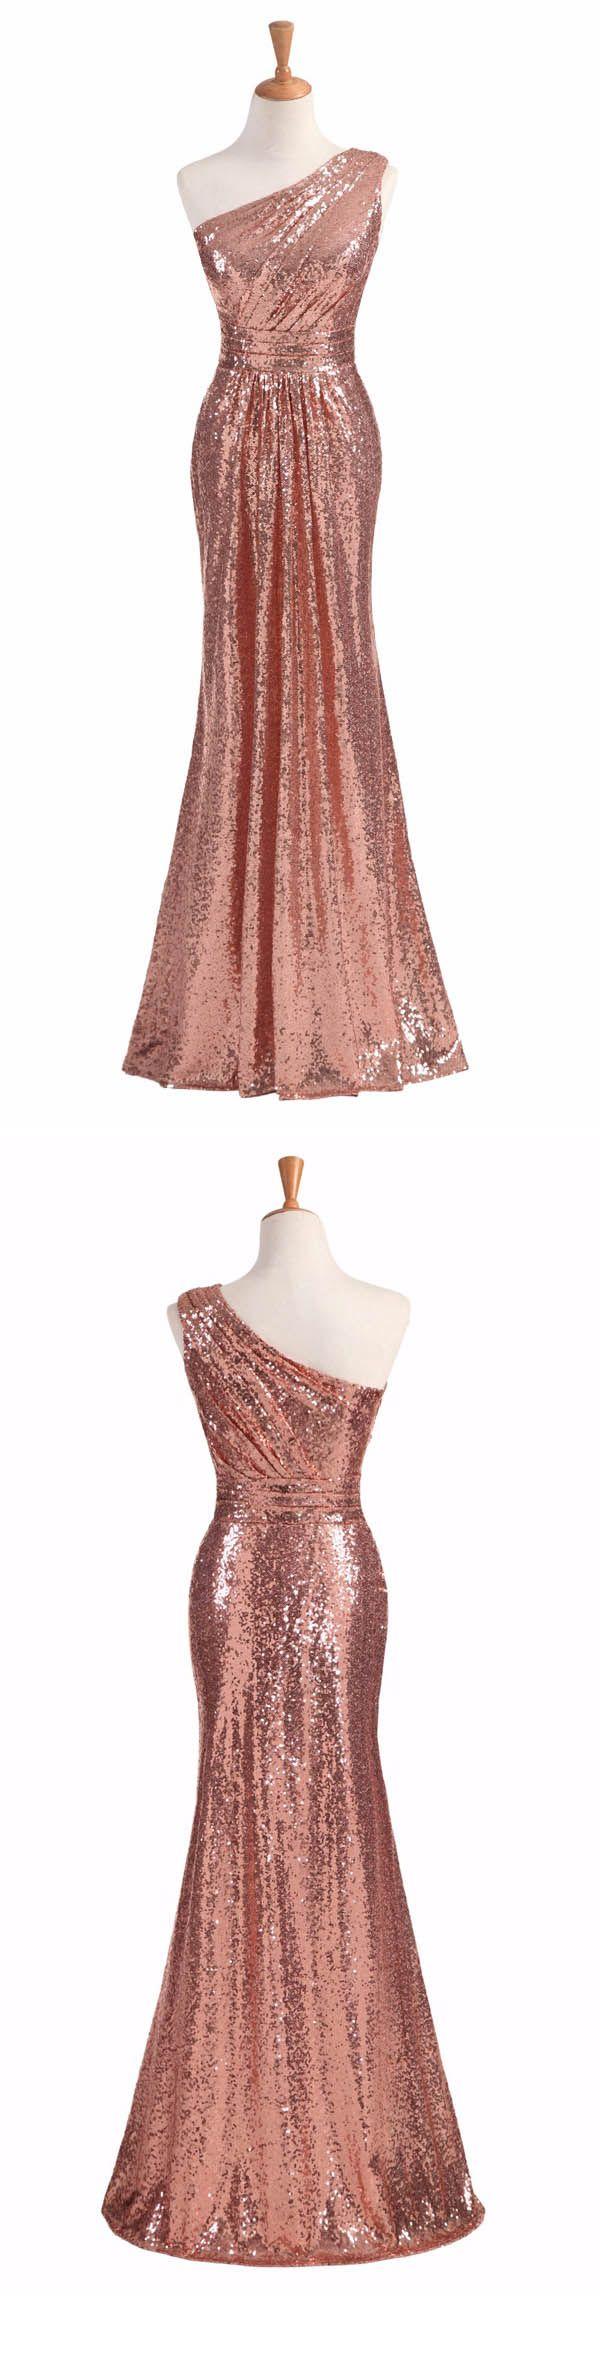 Long Bridesmaid Dress, One-Shoulder Dress, Sequin Bridesmaid Dress, Dress for Wedding, Mermaid Bridesmaid Dress, LB0159